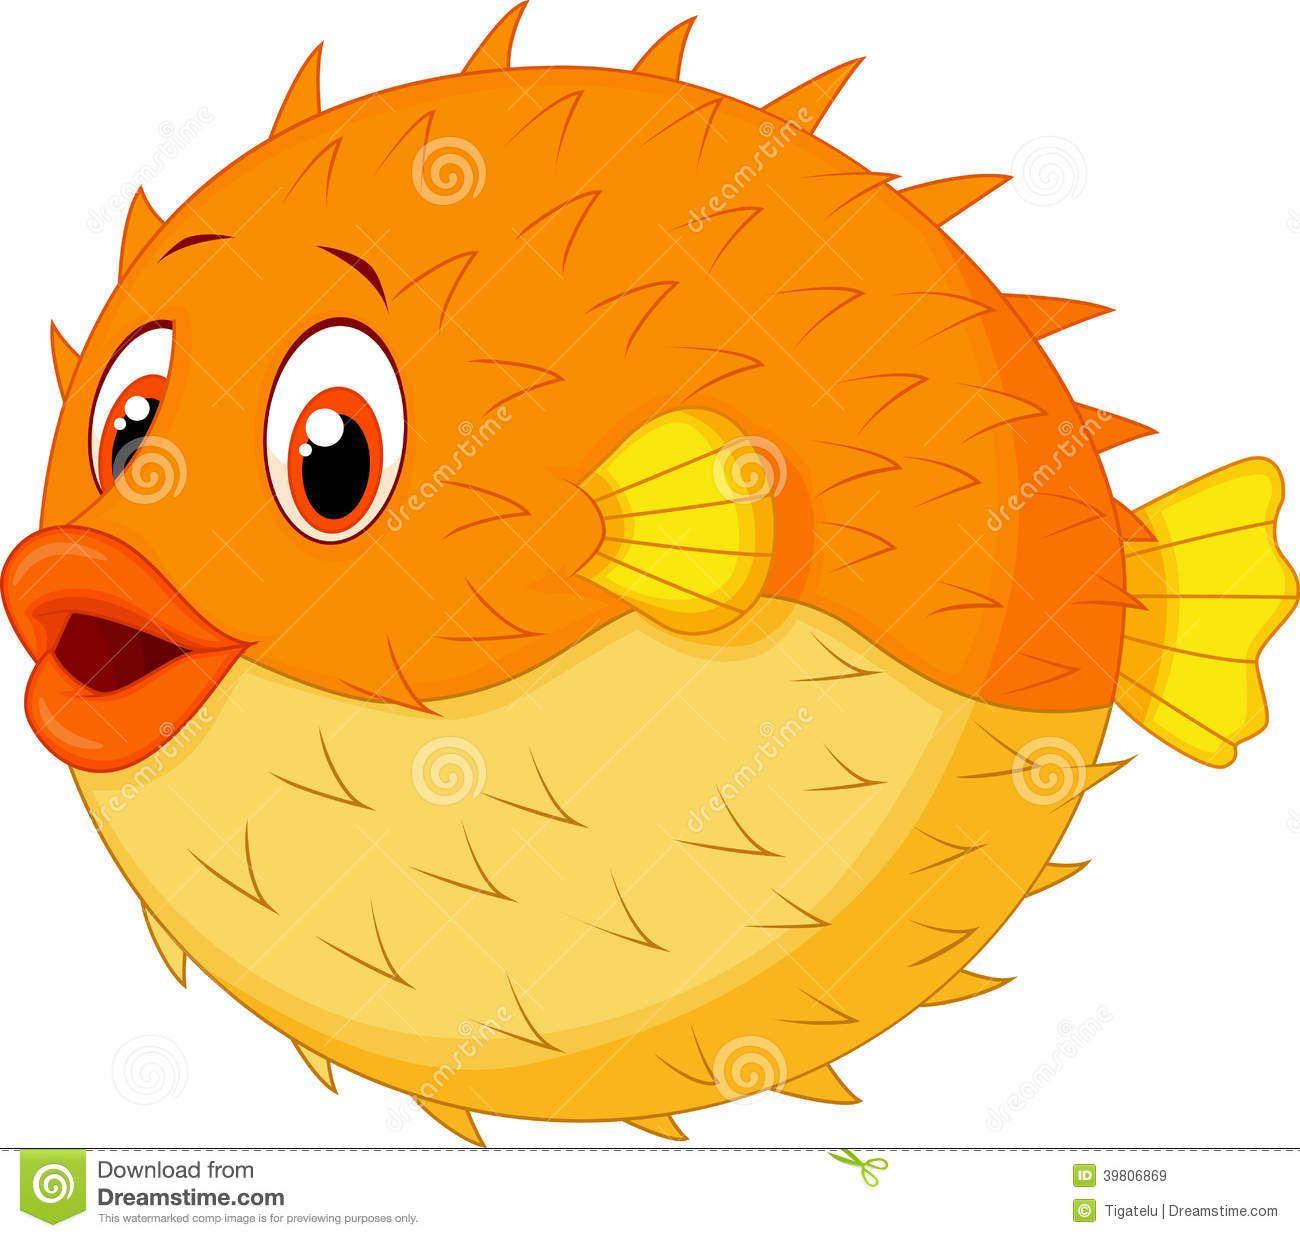 Illustration about Illustration of Cute puffer fish cartoon.